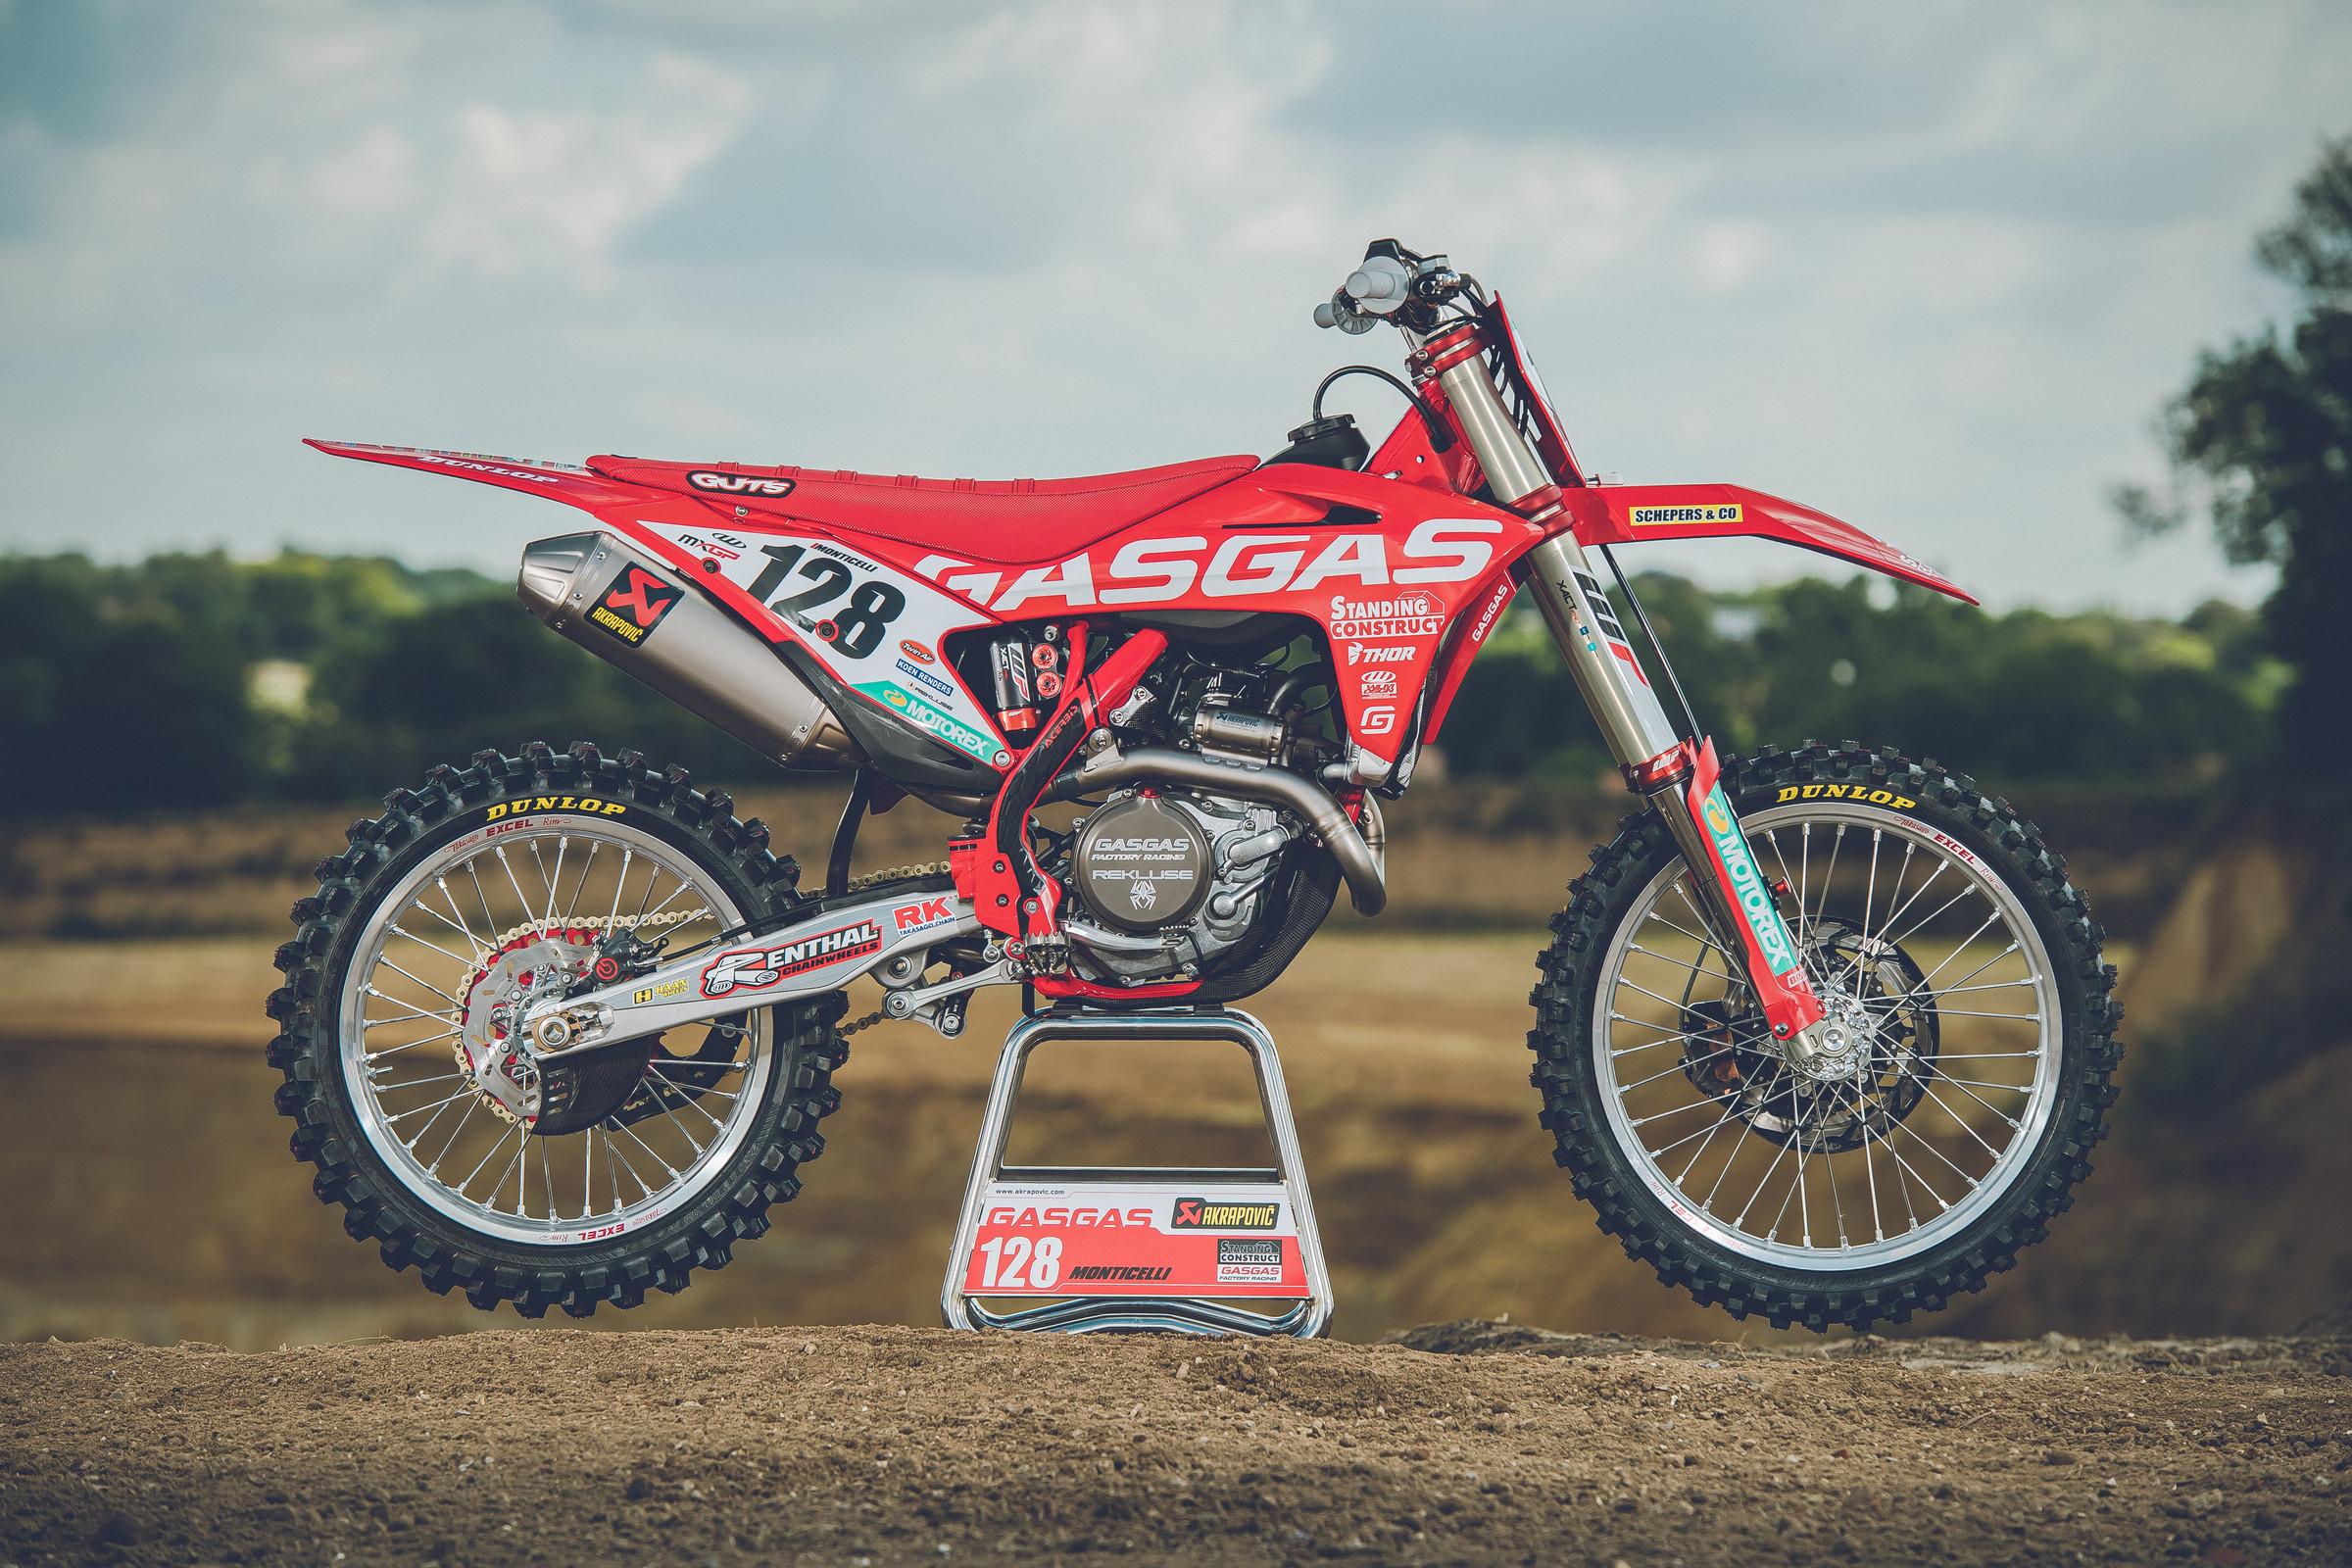 Gas Gas Unveils New Motocross Bikes For Mxgp Restart Racer X Online